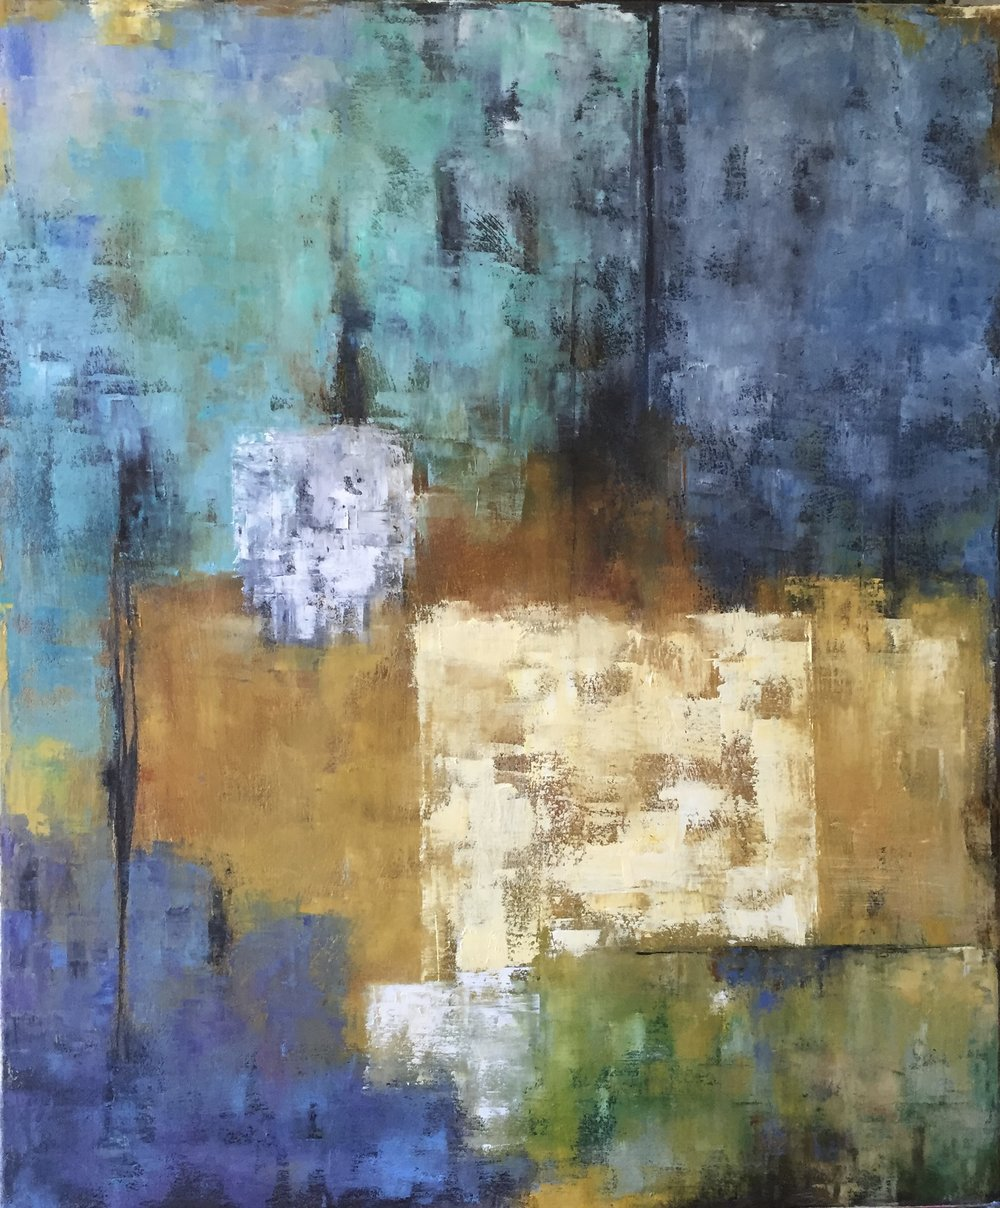 The Encounter, Oil on Canvas, 36x30